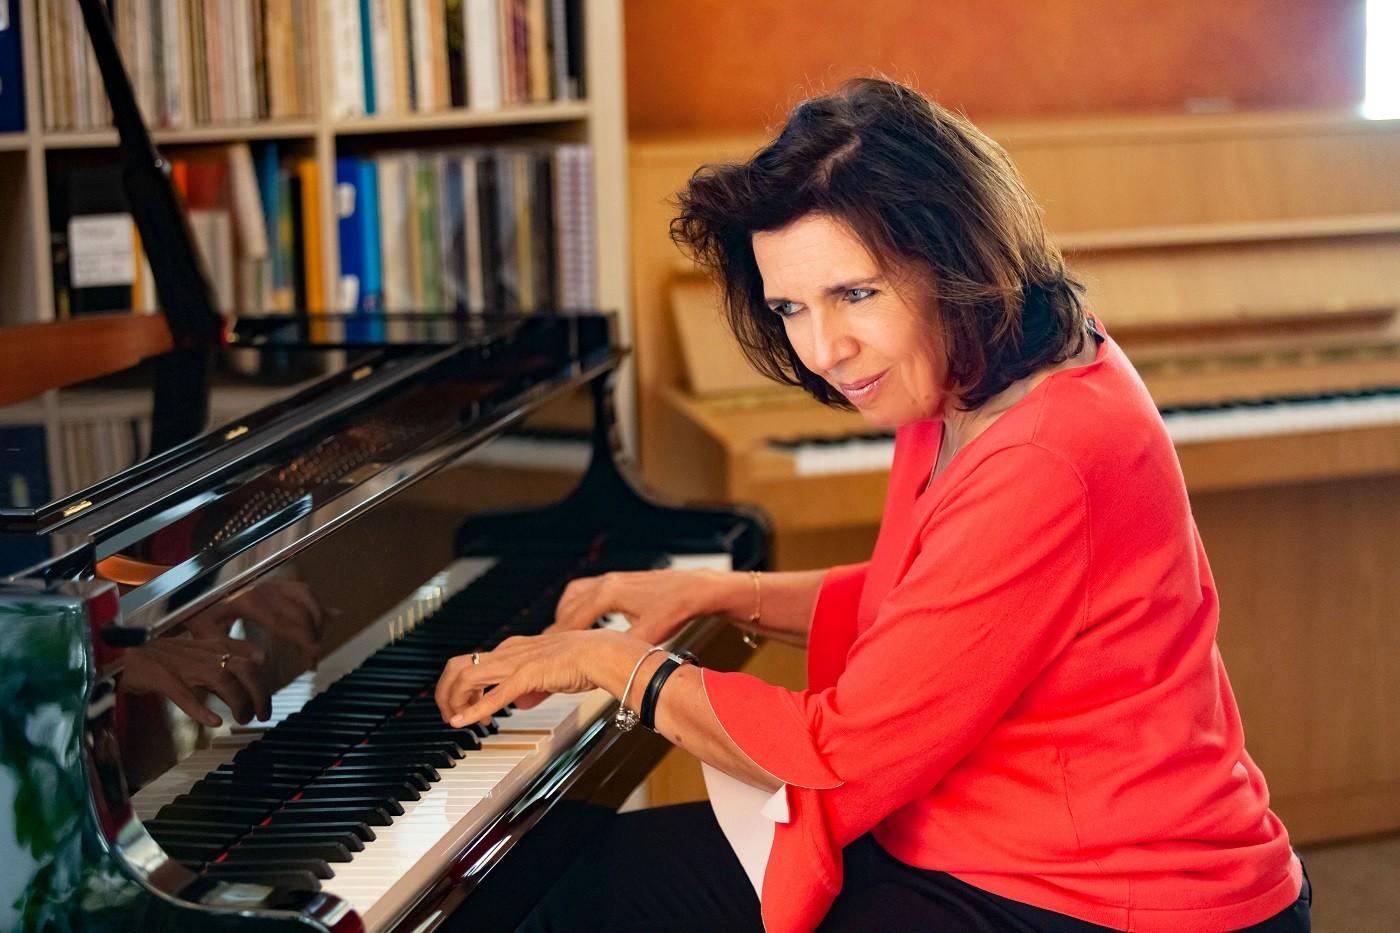 Susi's Bar Piano - Konzertstream aus dem Vereinsheim